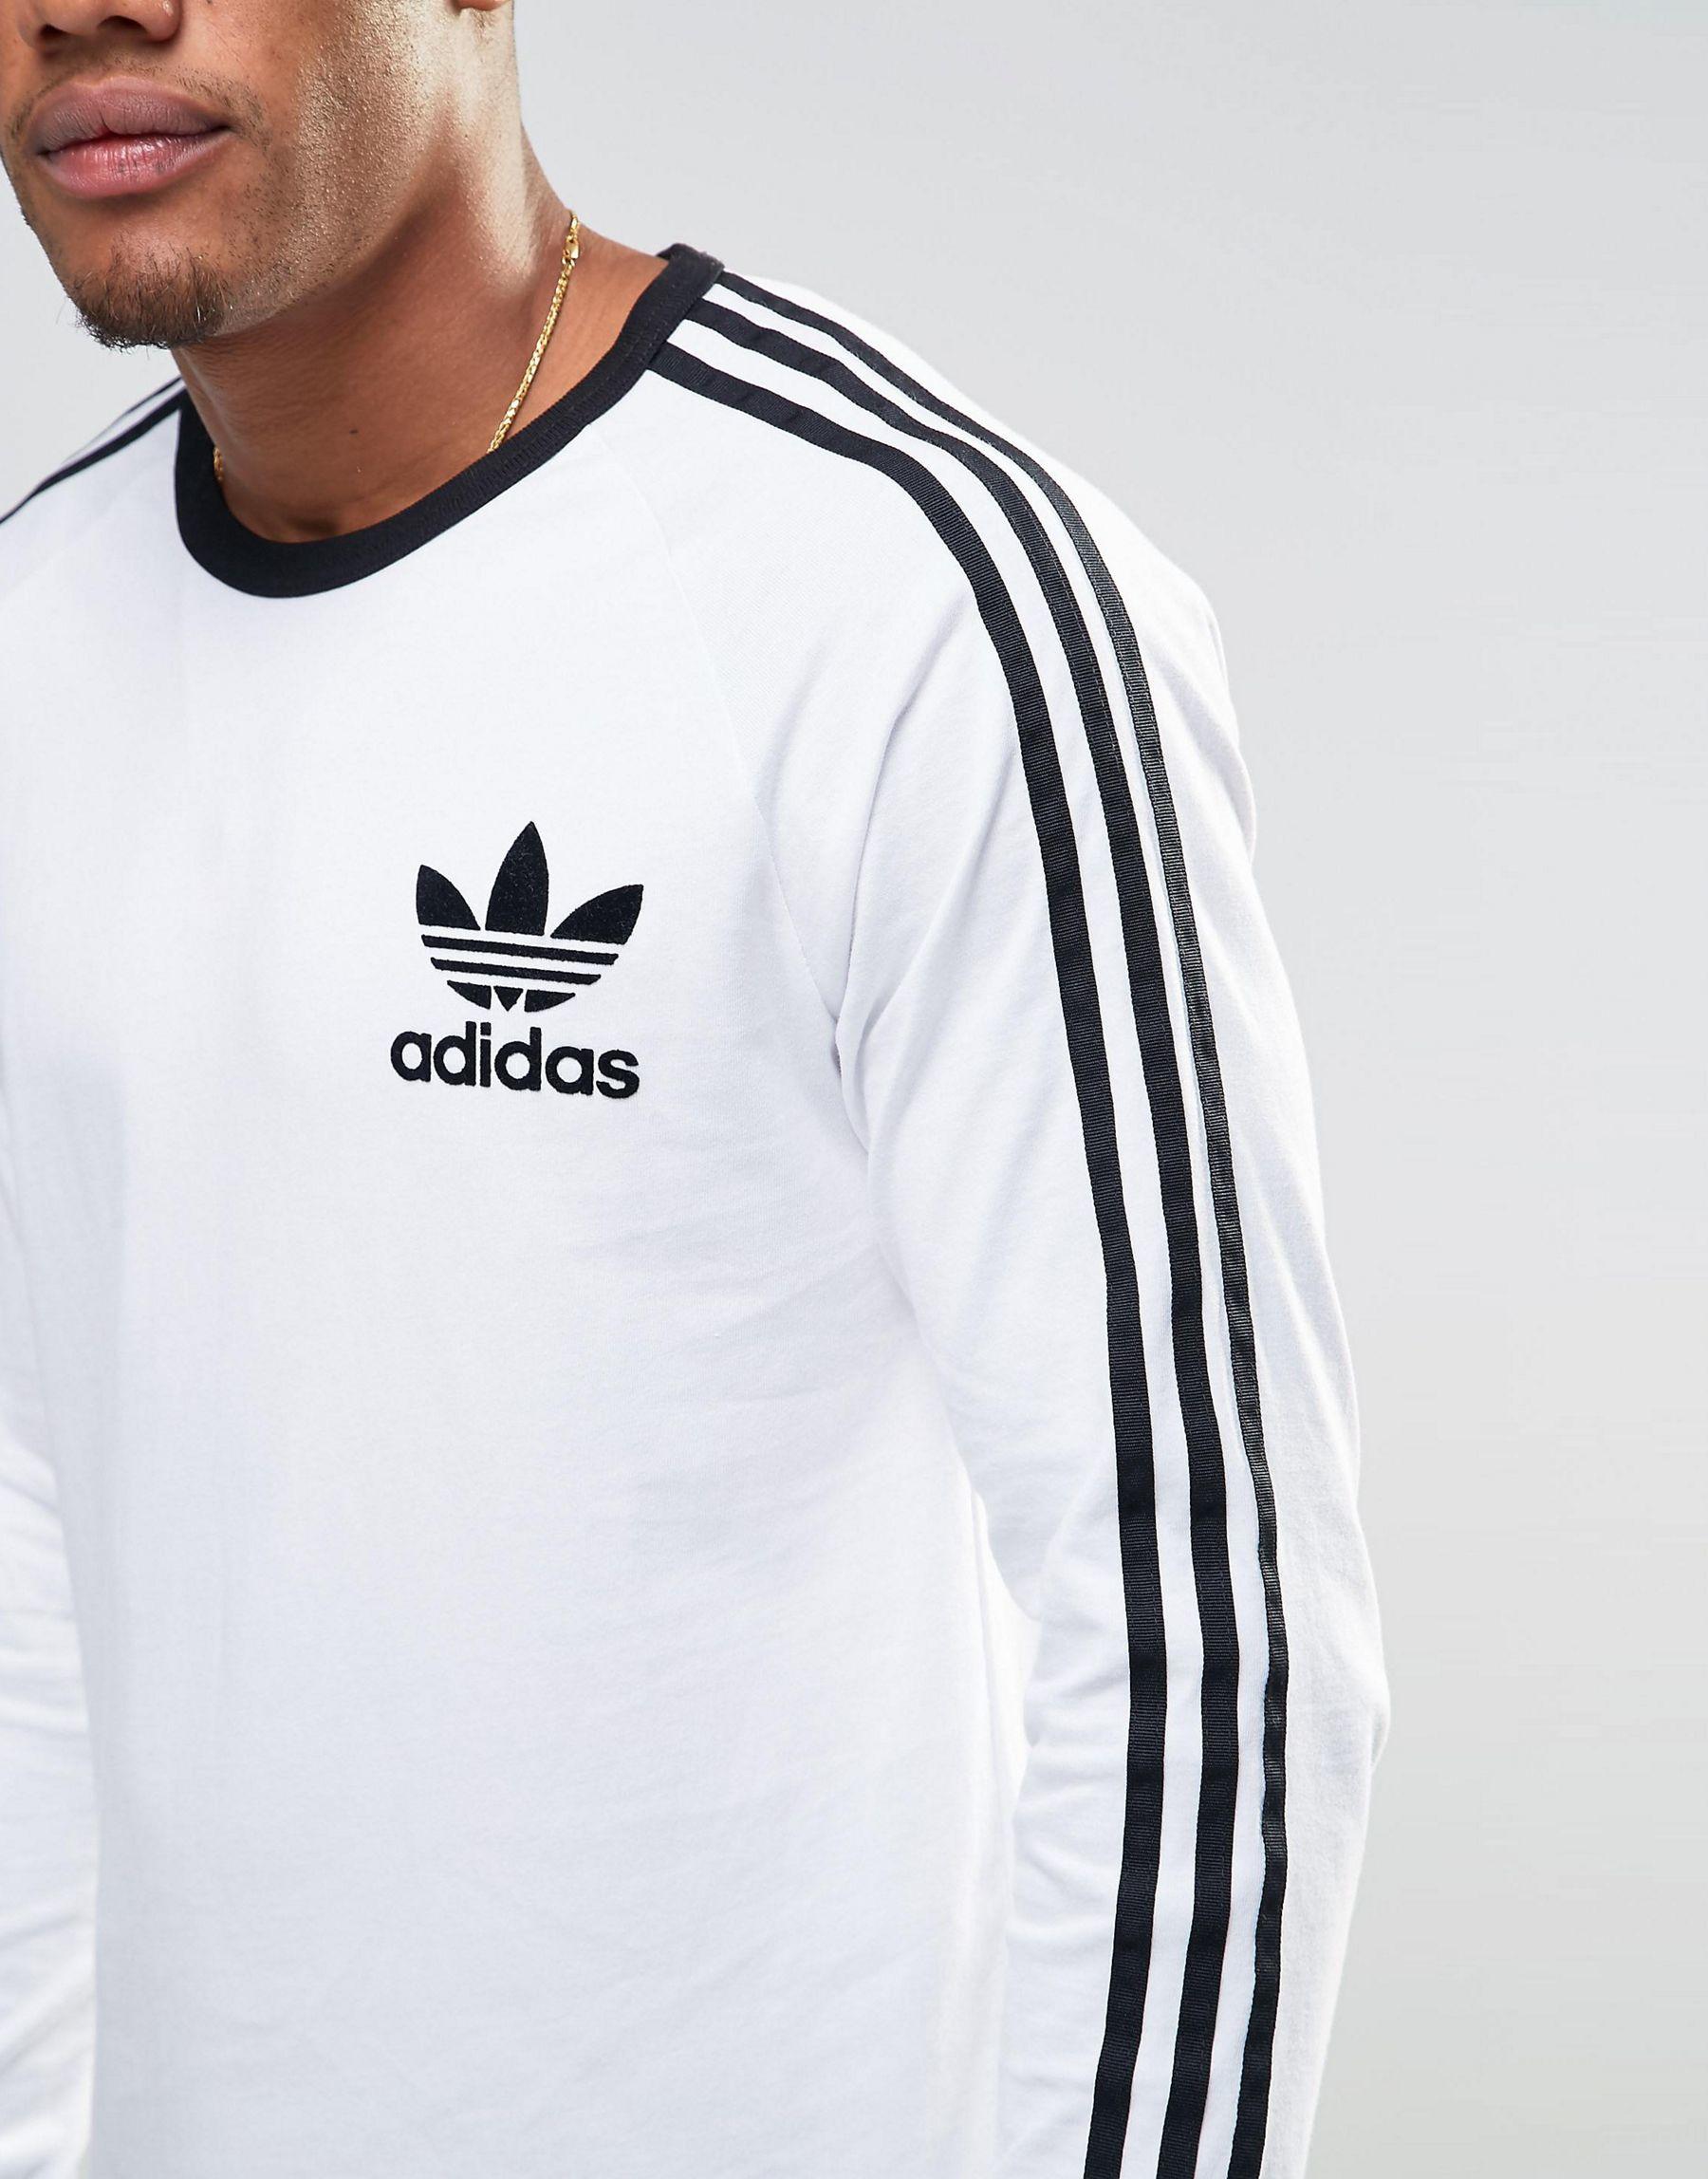 7e9c2e7c adidas originals men's adicolor fashion long sleeve t shirt black Lyst -  adidas Originals Adicolor Longline Long Sleeve T-shirt In ..